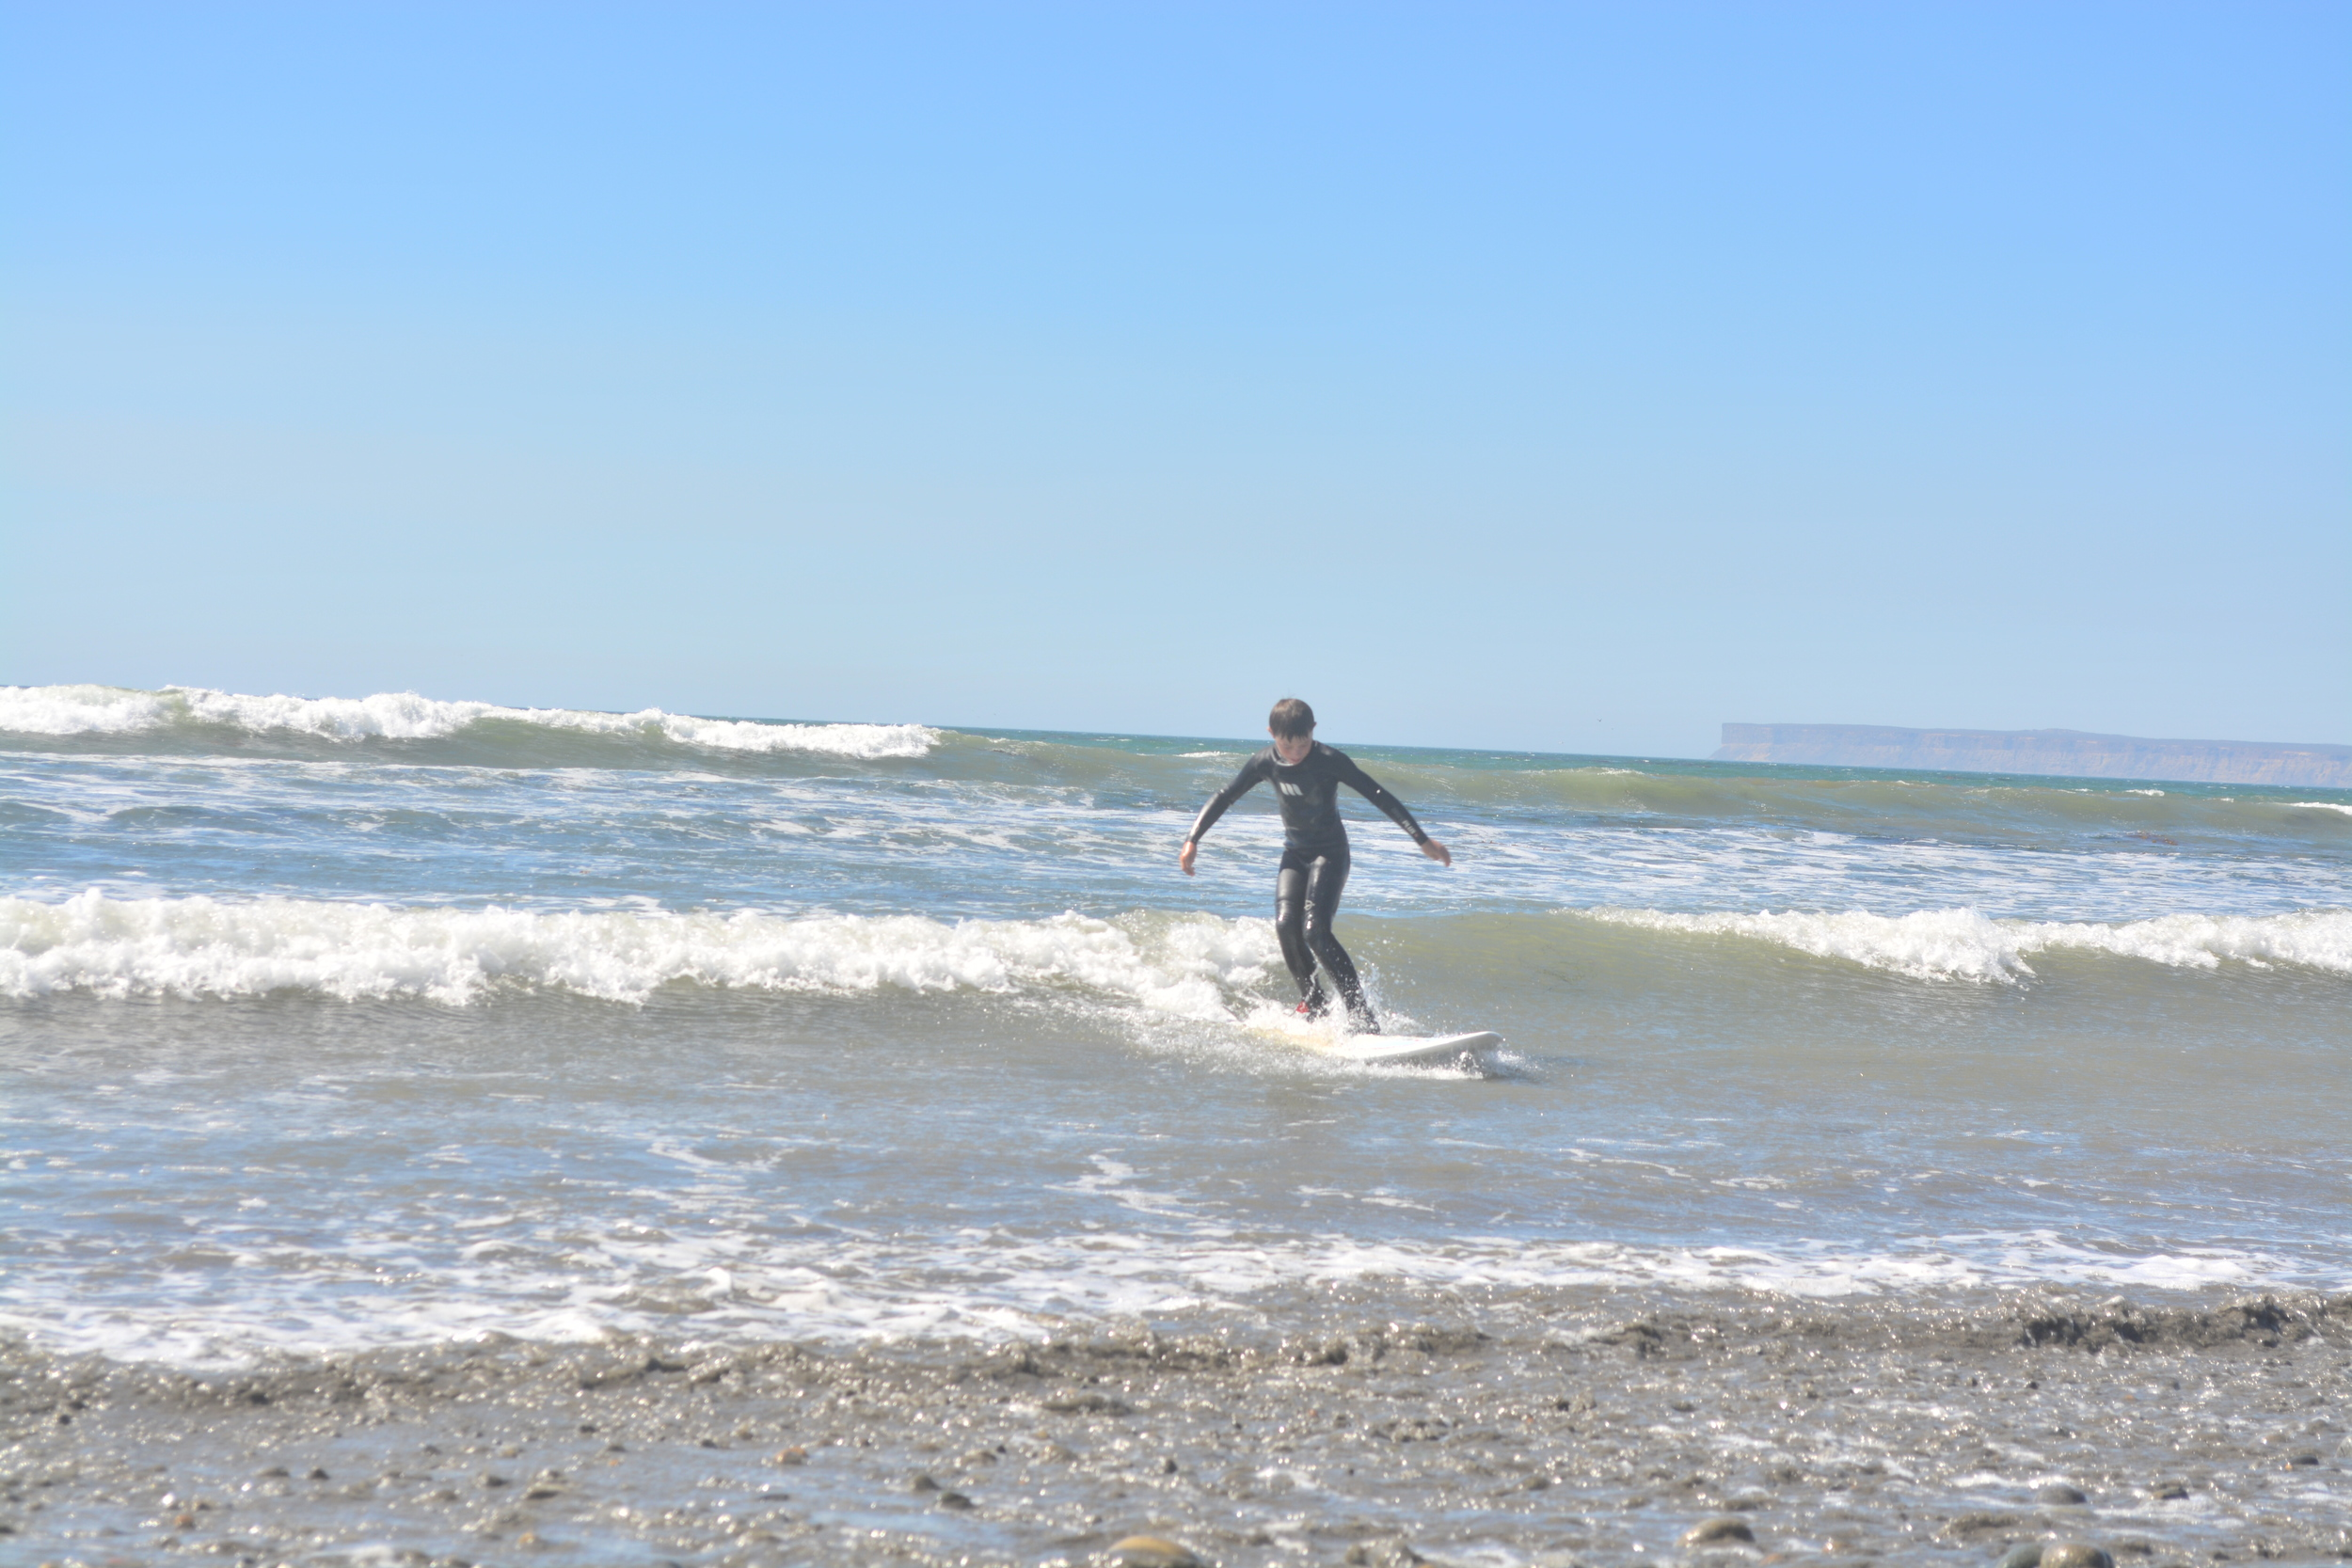 Baja California 10-5-13 Shipwrecks Surfing Adventure Ocean Experience Surf School San Diego (19).JPG